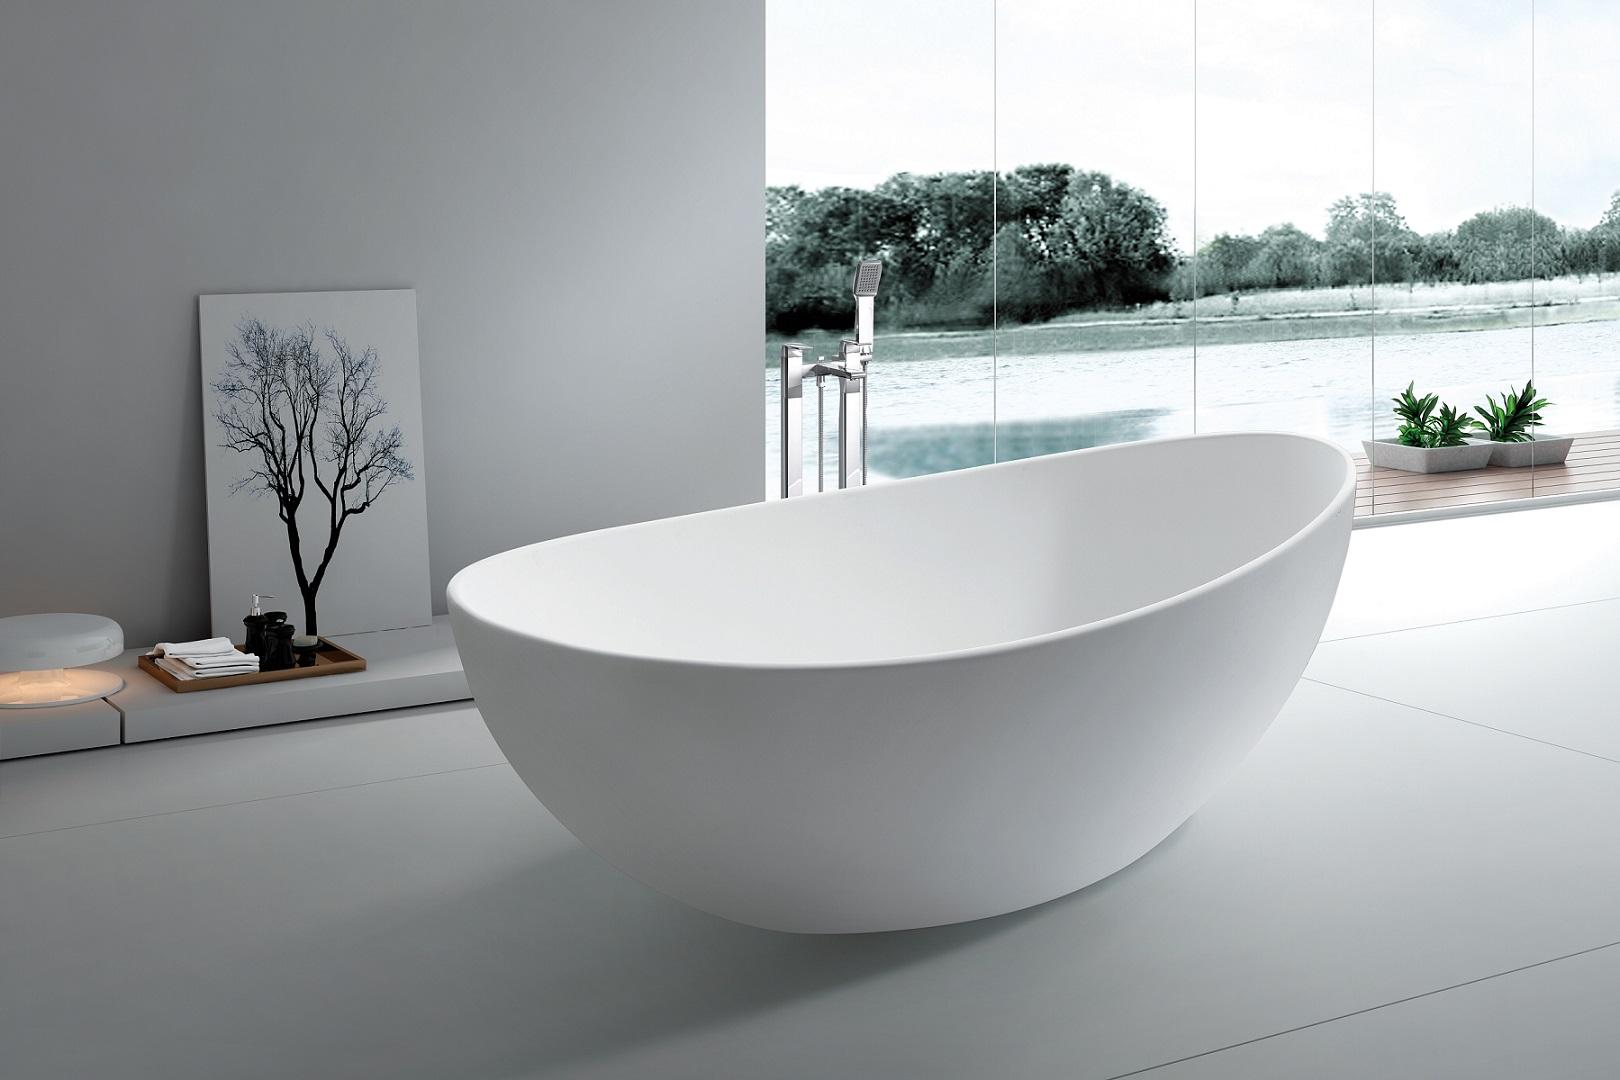 Design Collection Mesmerizing Modern Bathrooms Bath Tub 50 New Inspiration